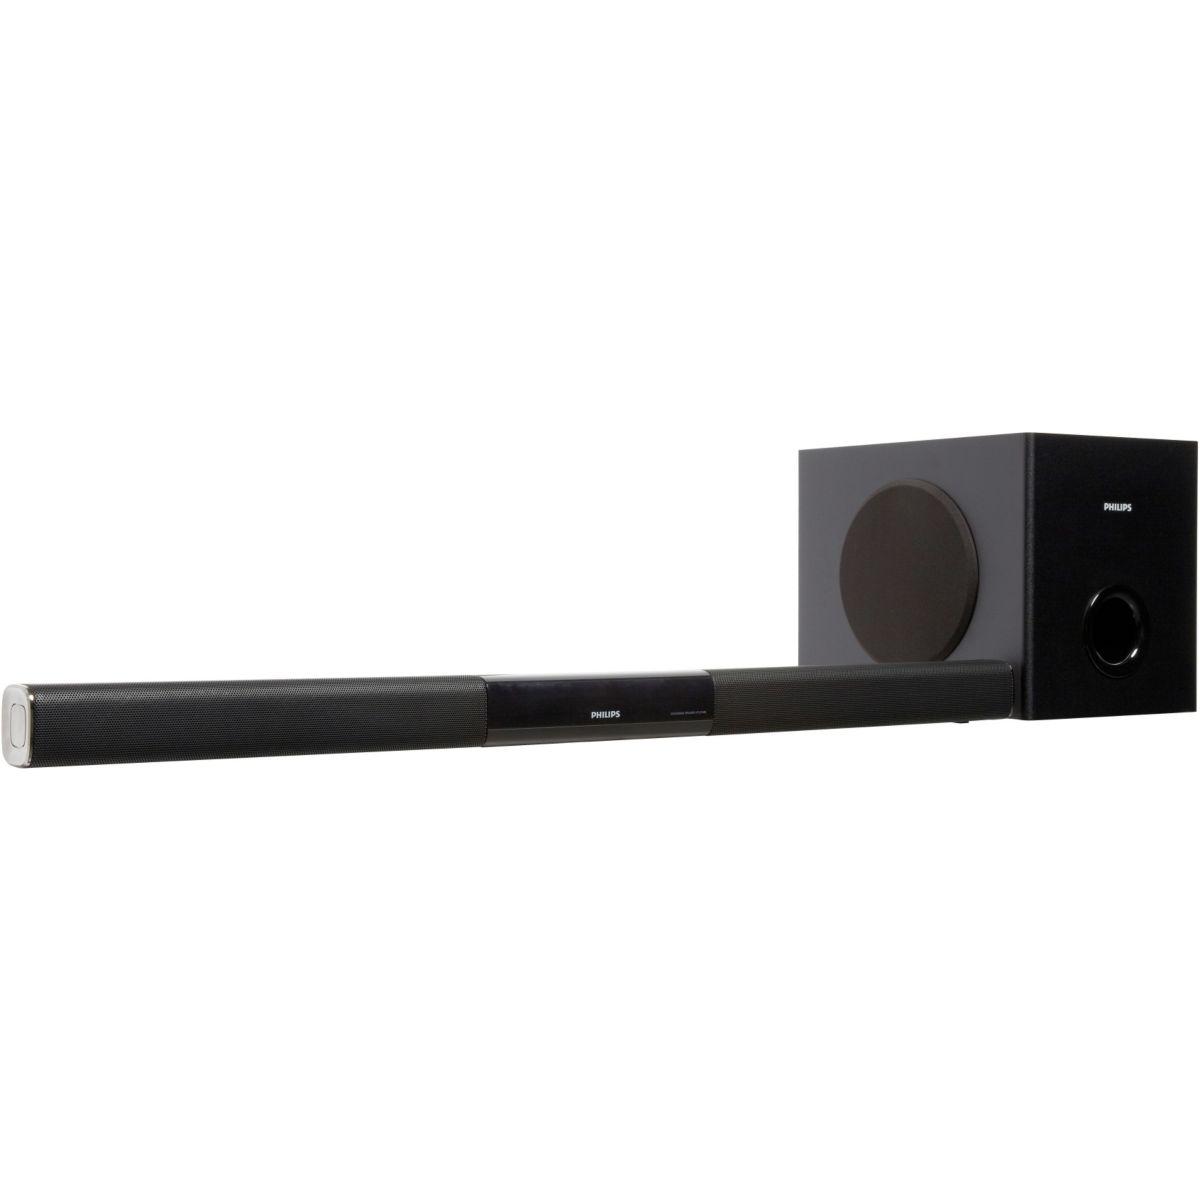 philips htl3140 barre de son ultracompacte 2 1 200 watts. Black Bedroom Furniture Sets. Home Design Ideas